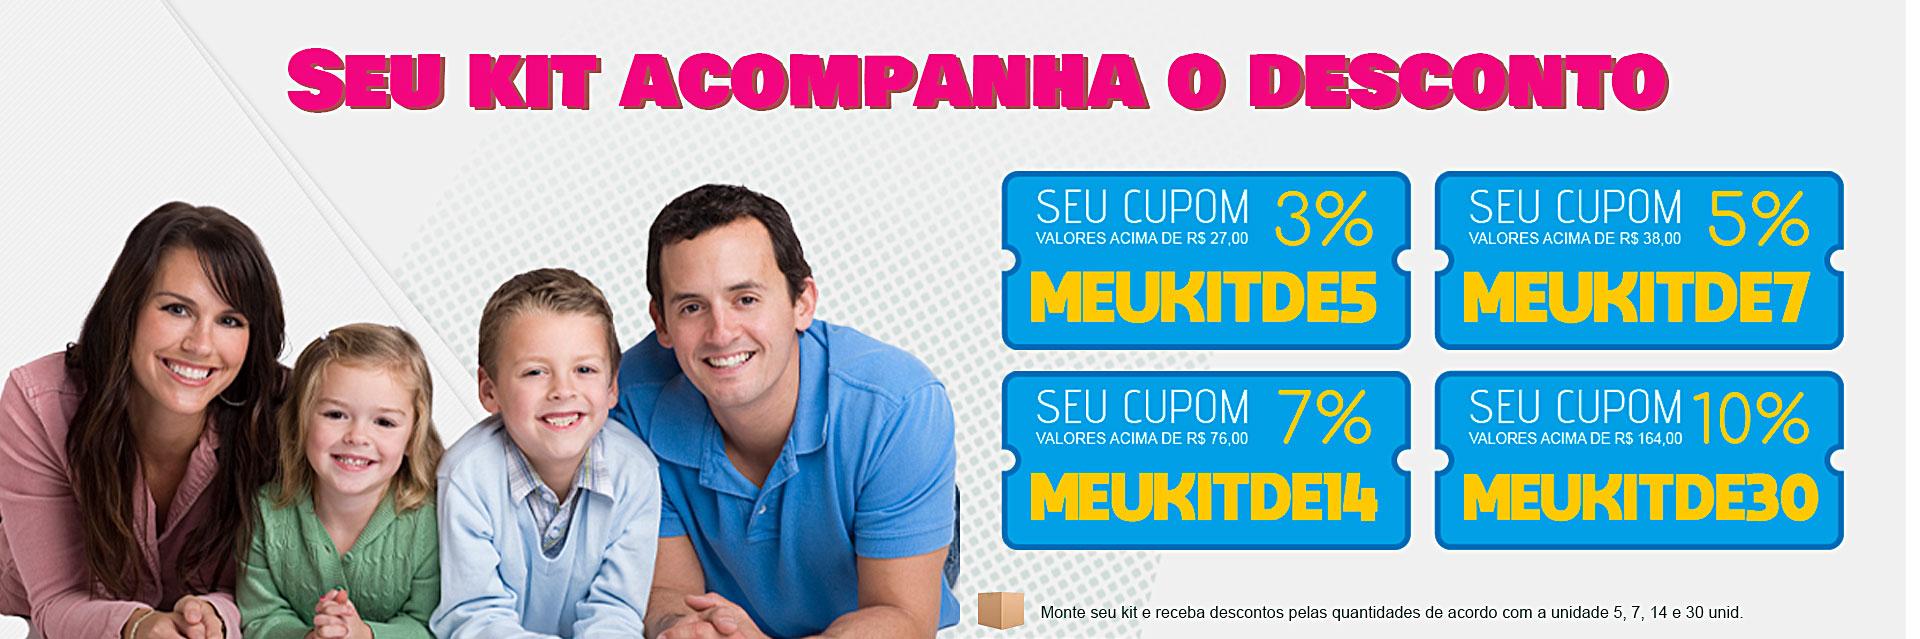 Cupon-hd